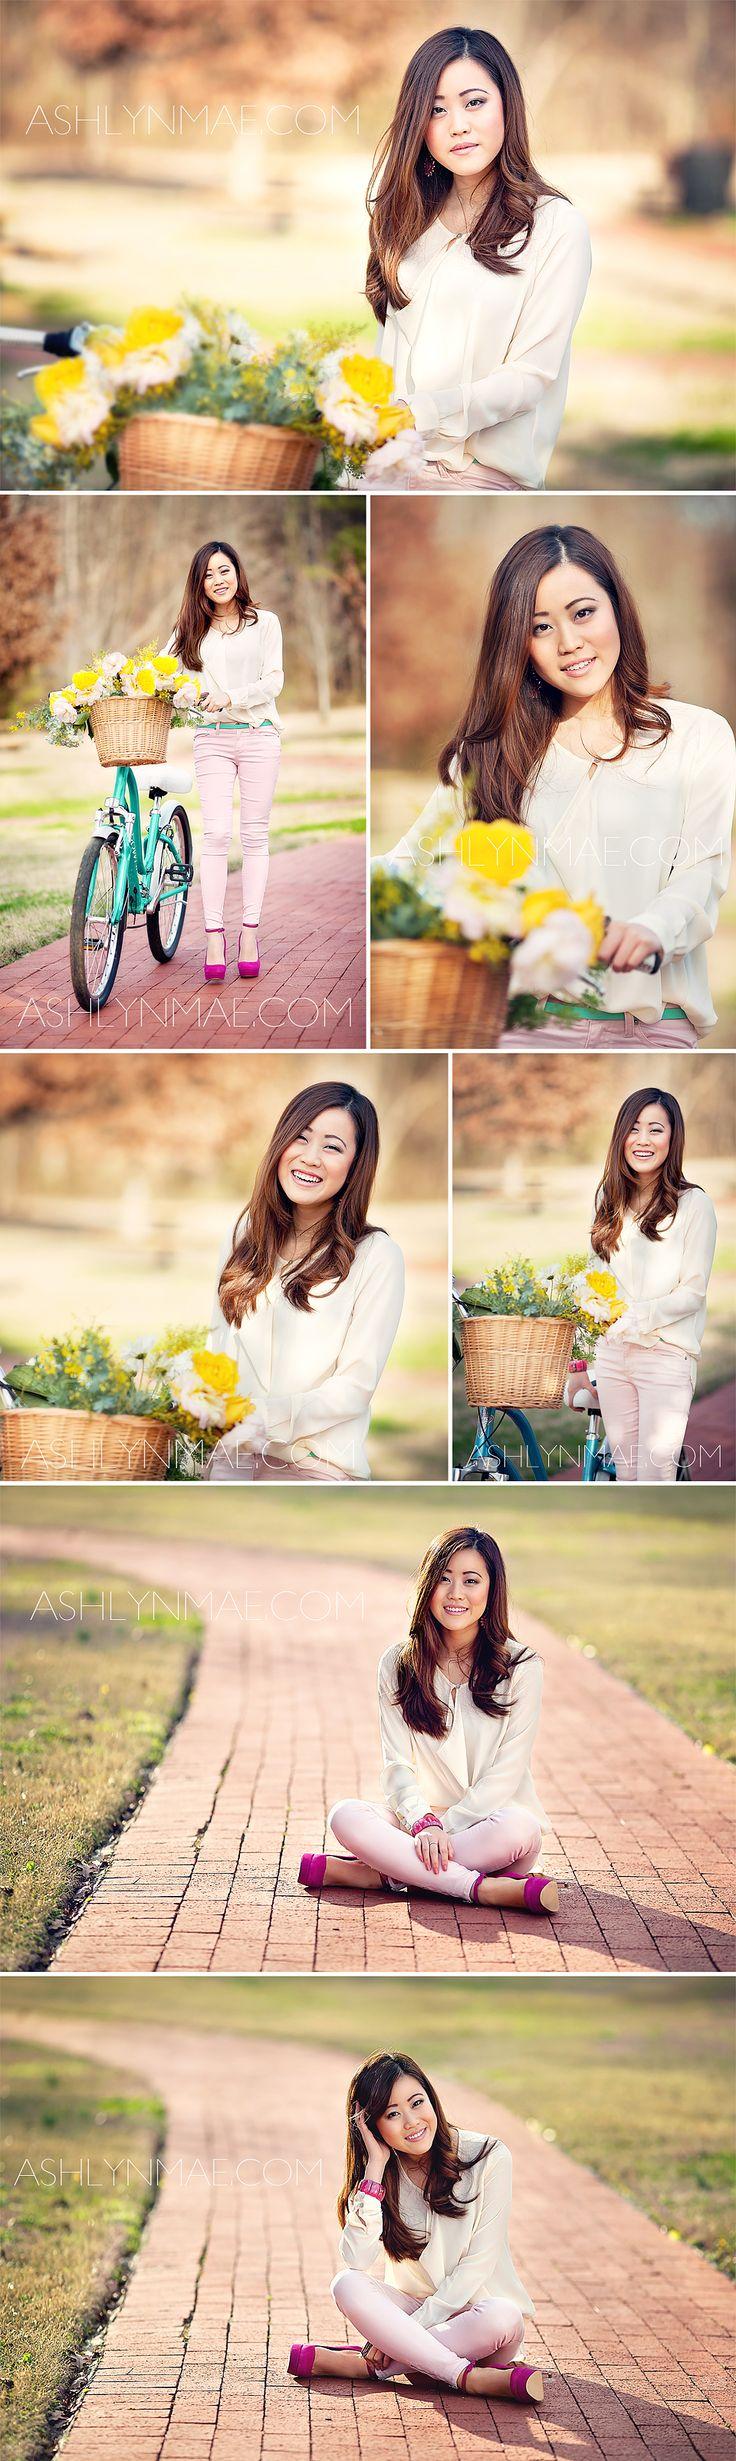 Ashlyn Mae Photography | Greenville, SC High School Senior Photograpy